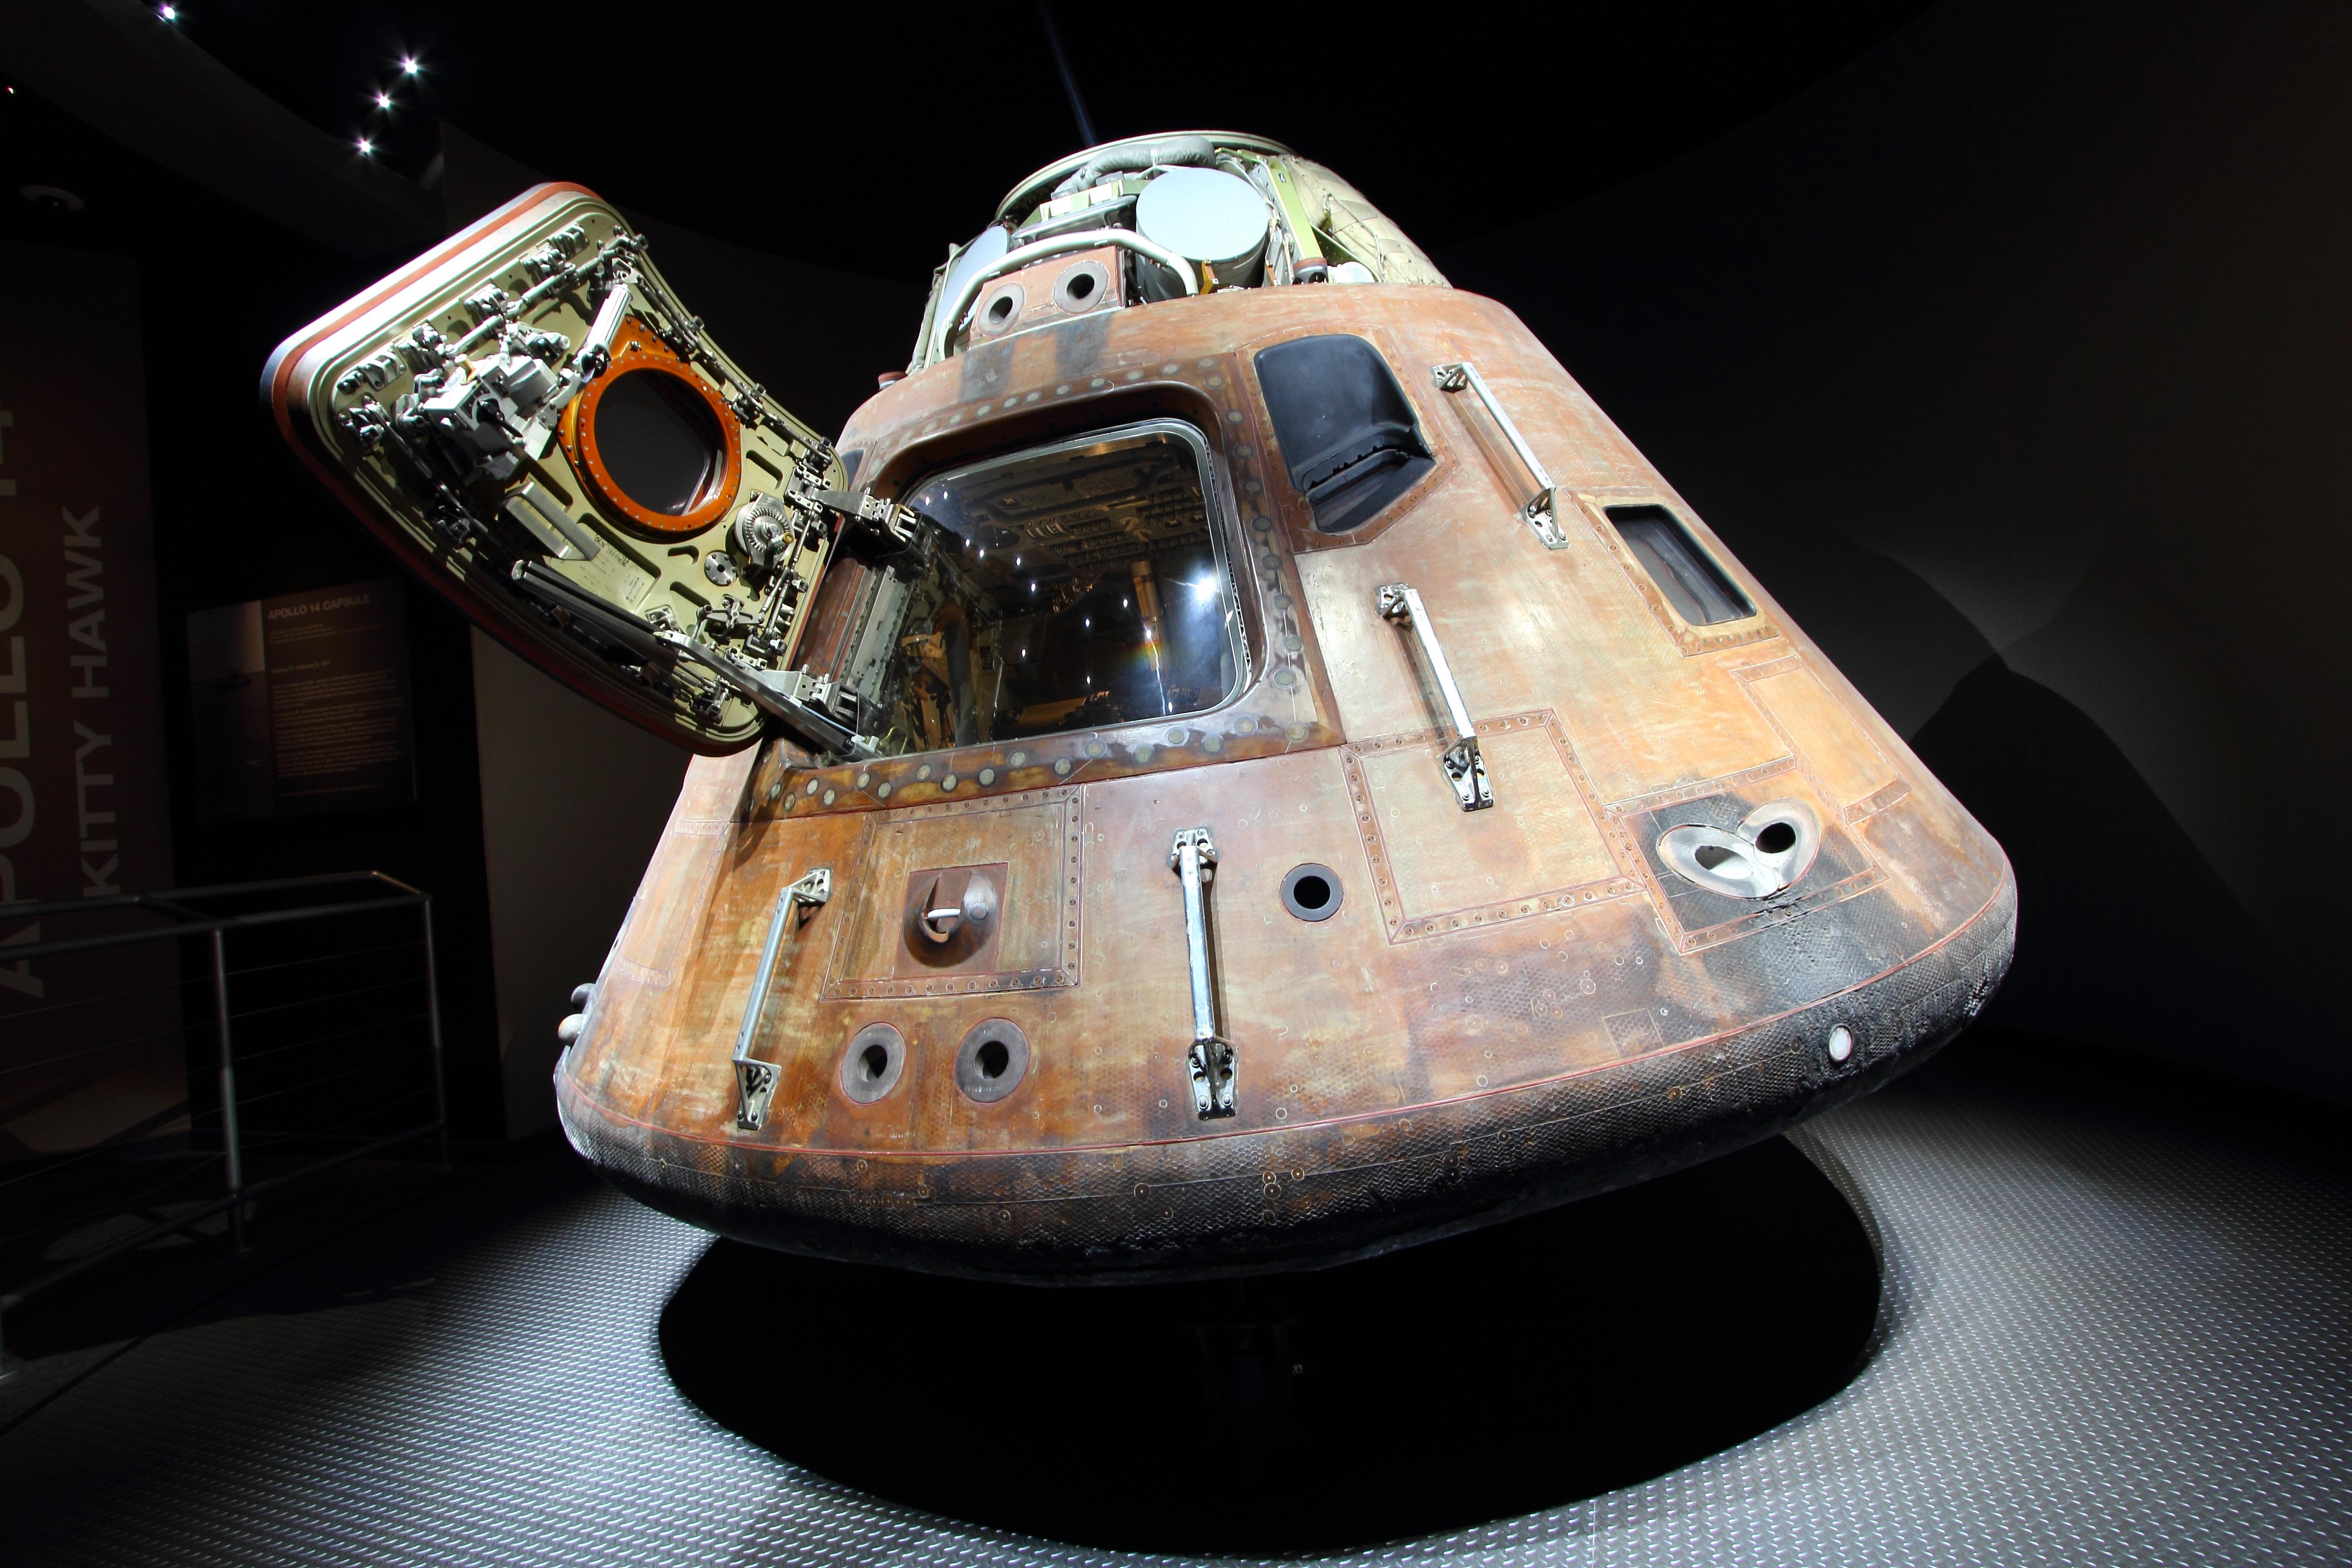 Apollo command module EVA handles post-reentry ...